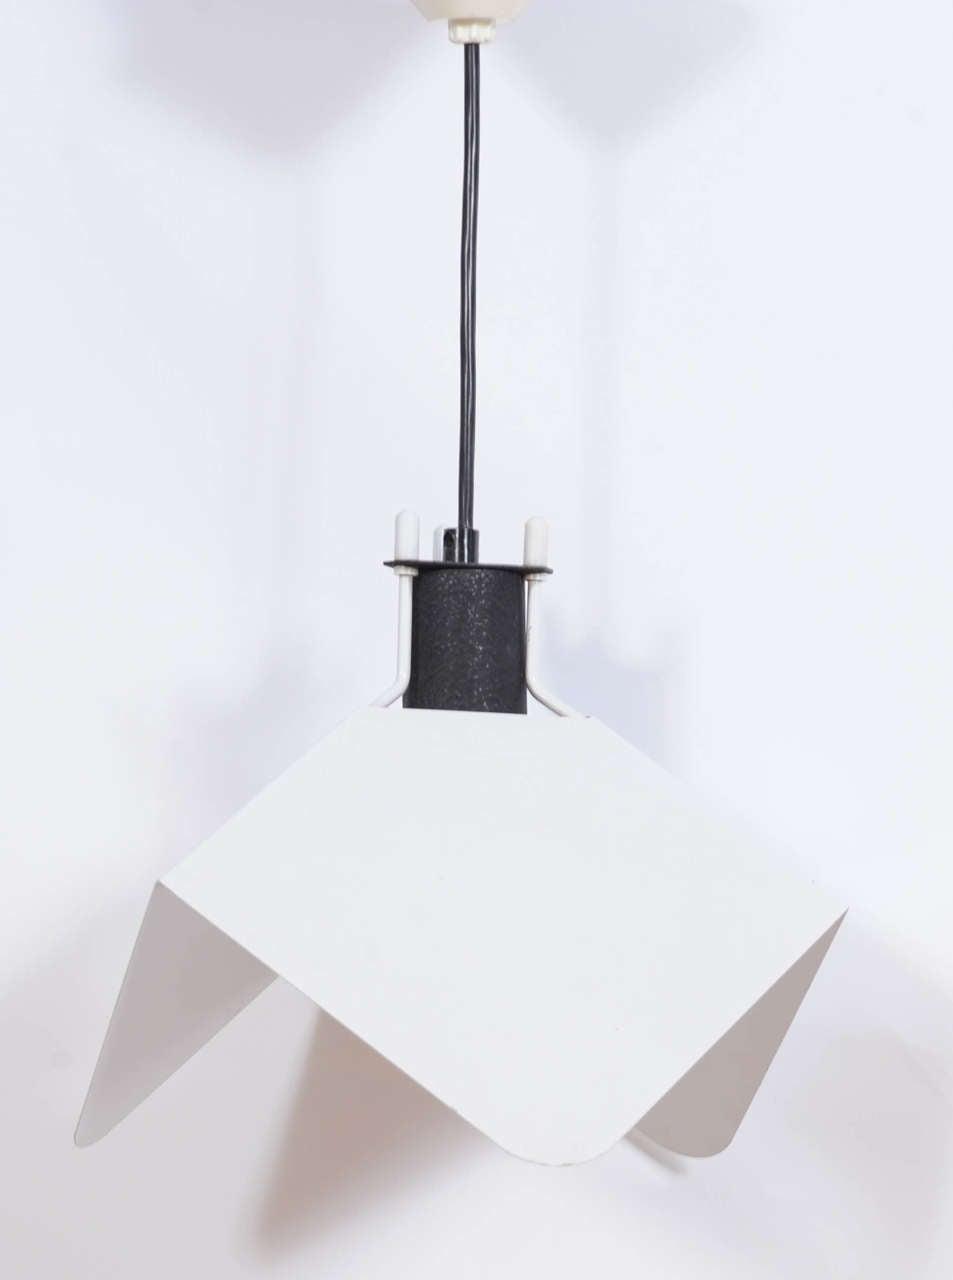 Italian Rare Set of Two Triedro Pendants by Joe Colombo for Stilnovo For Sale